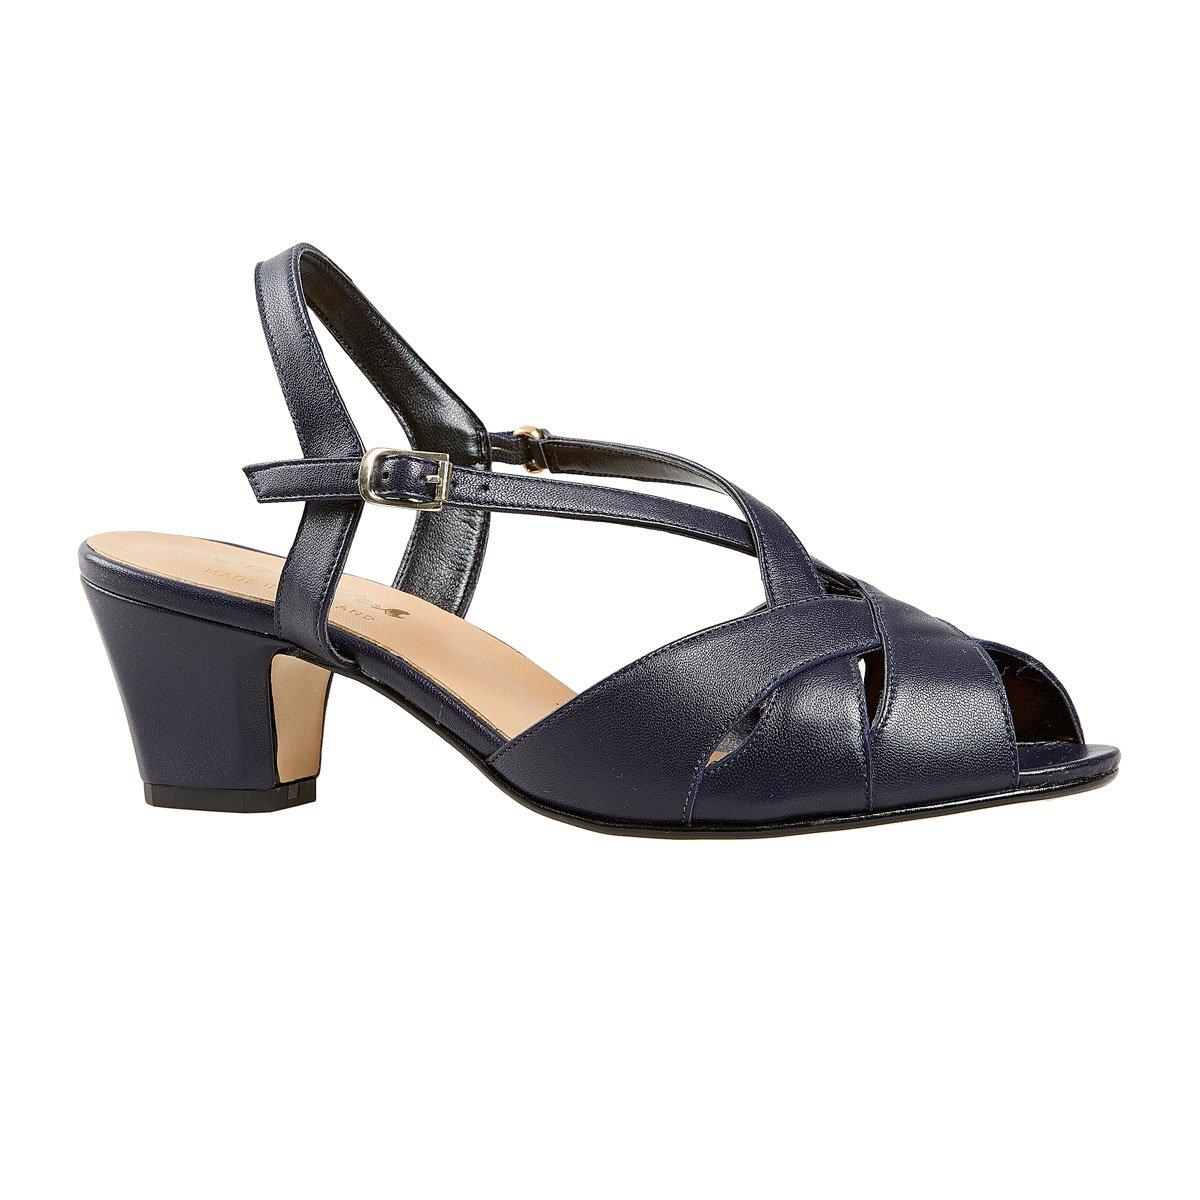 d05ef251ba Van Dal Women s Libby Ii Open-Toe Sandals  Amazon.co.uk  Shoes   Bags